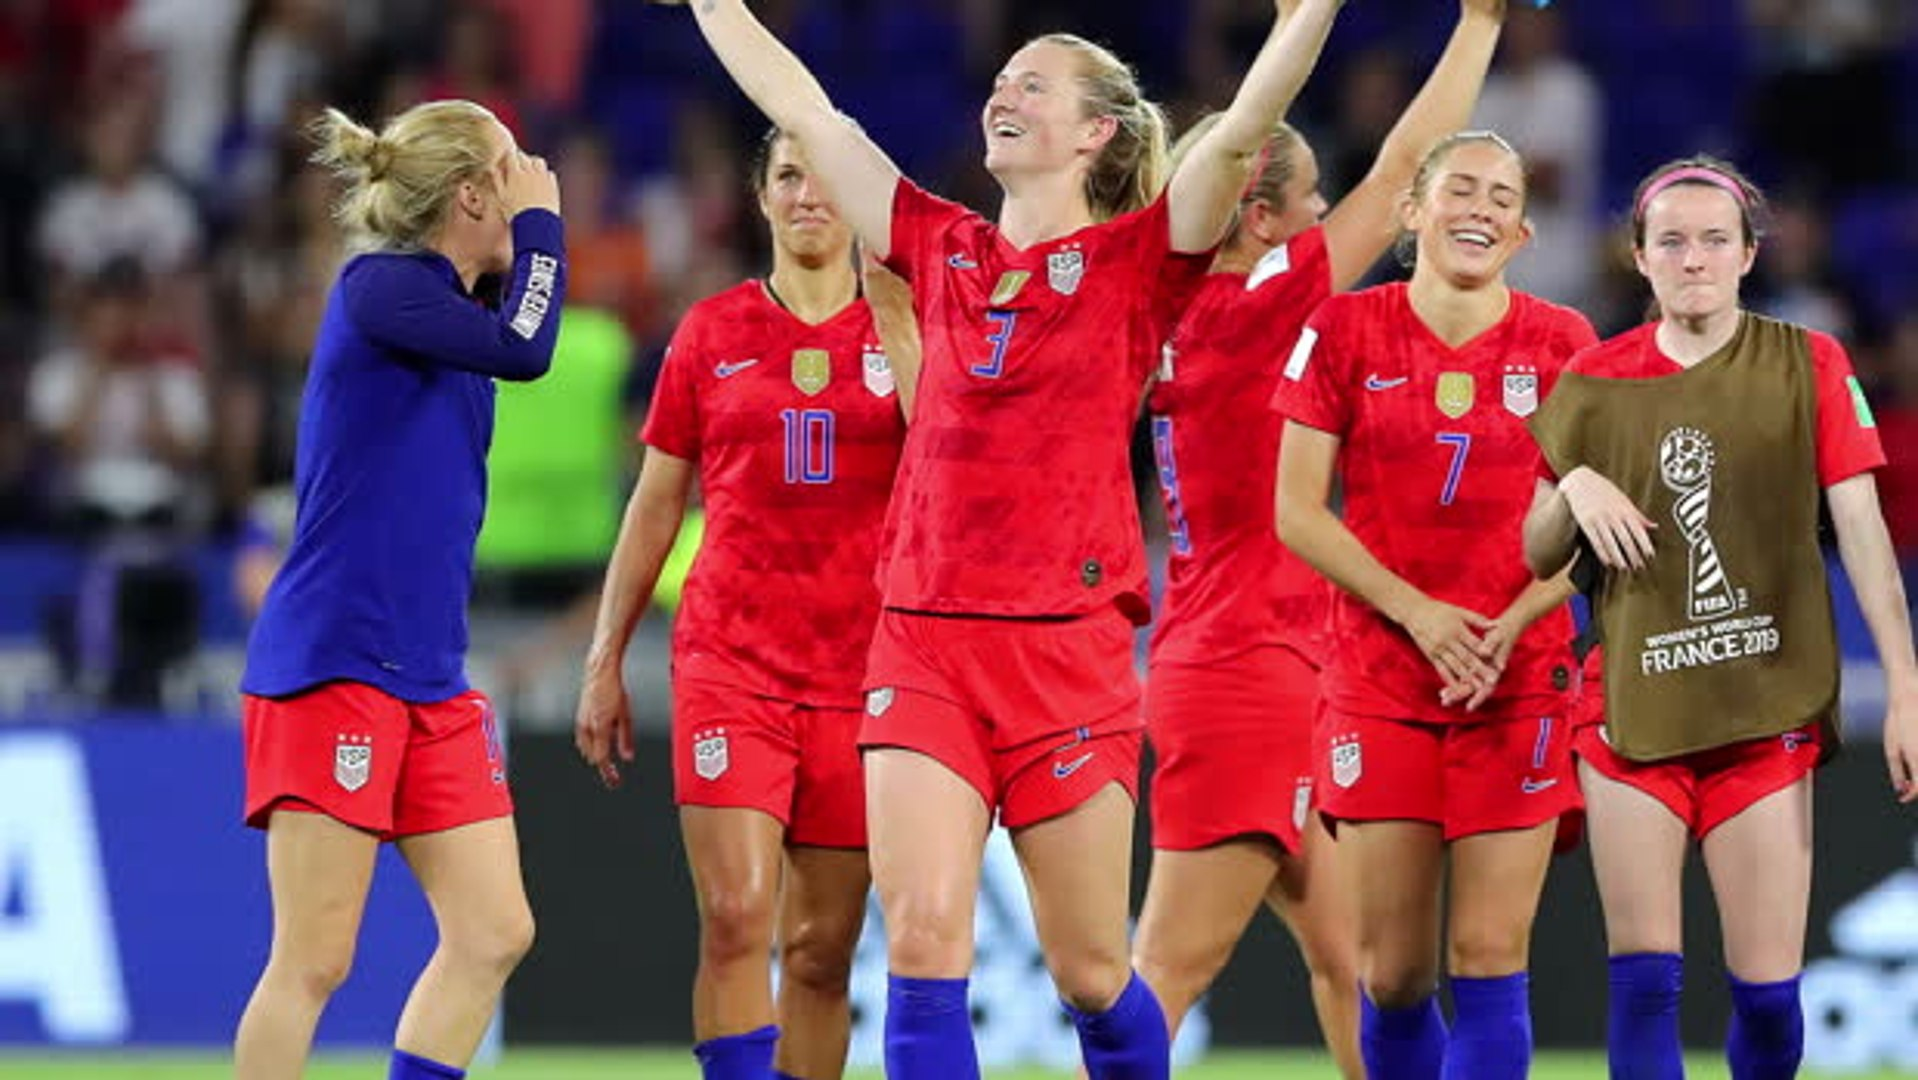 NFL players react to USA's win over England